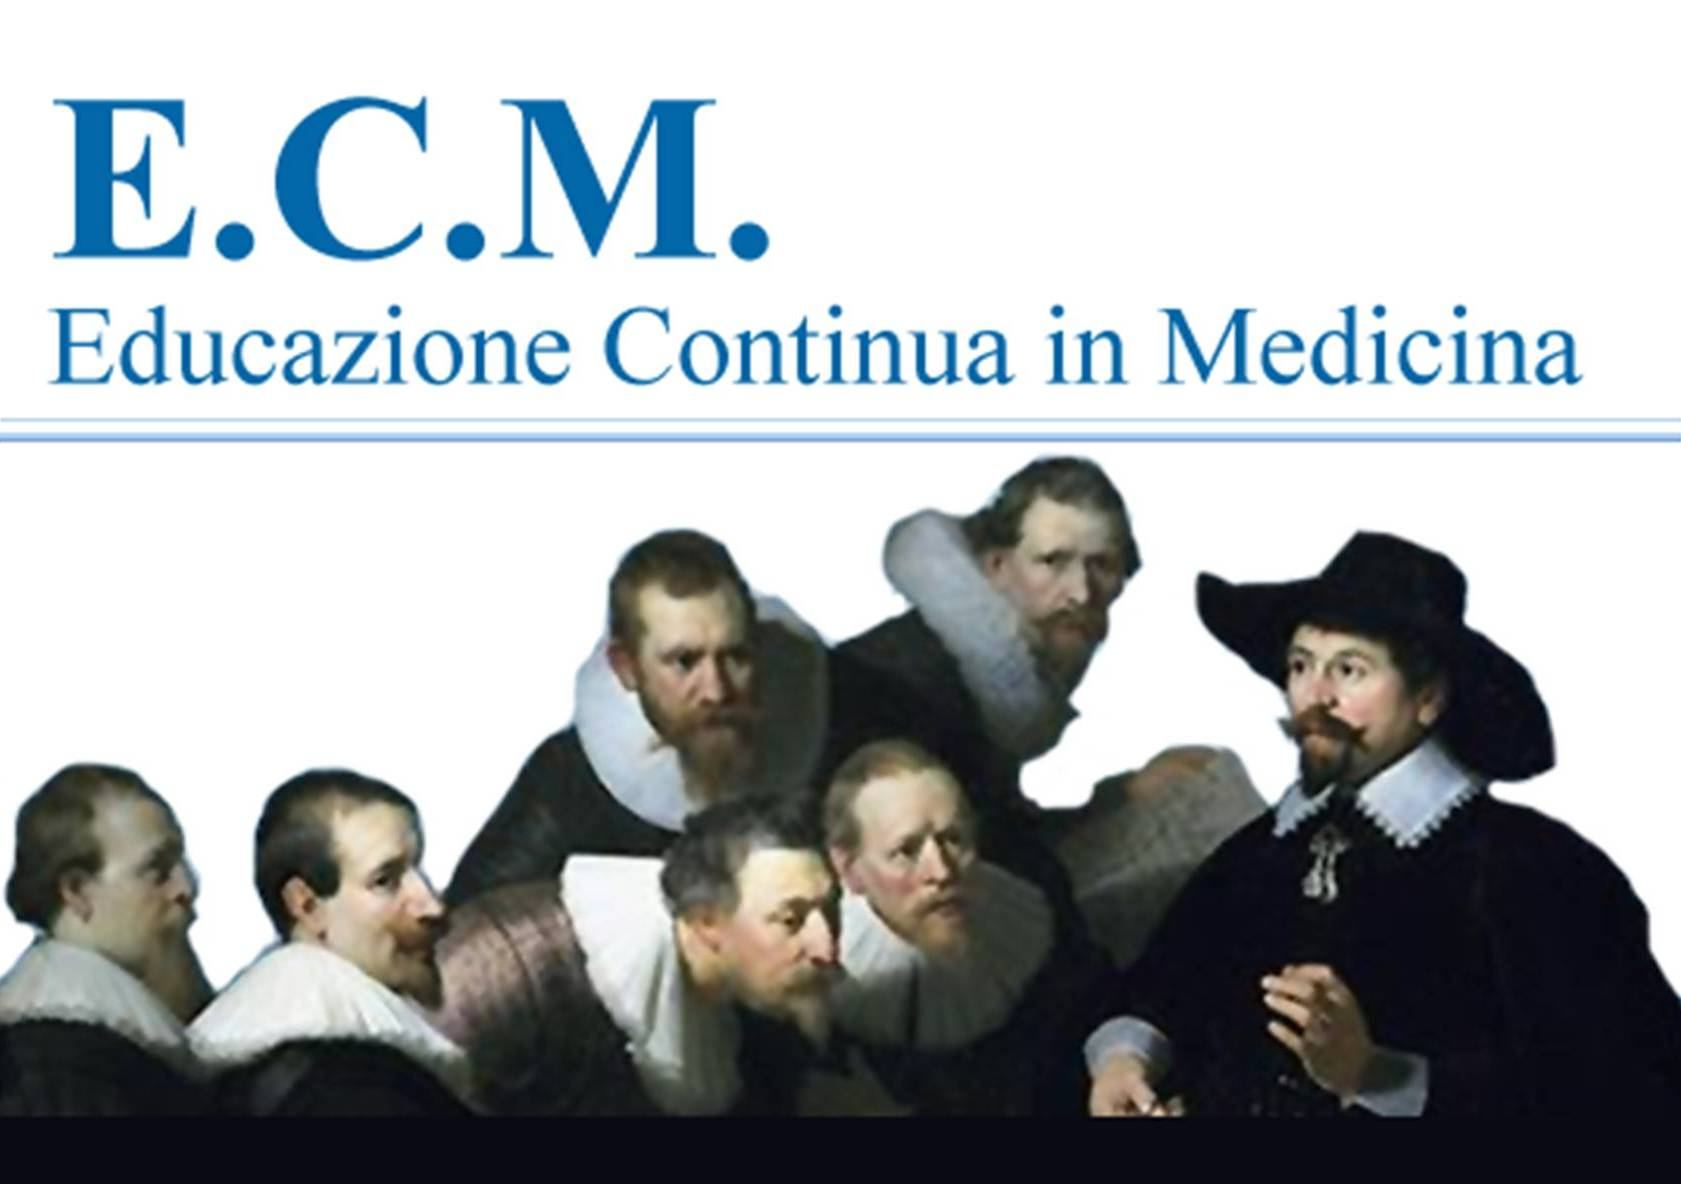 Educazione continua in medicina ECM Gestalt